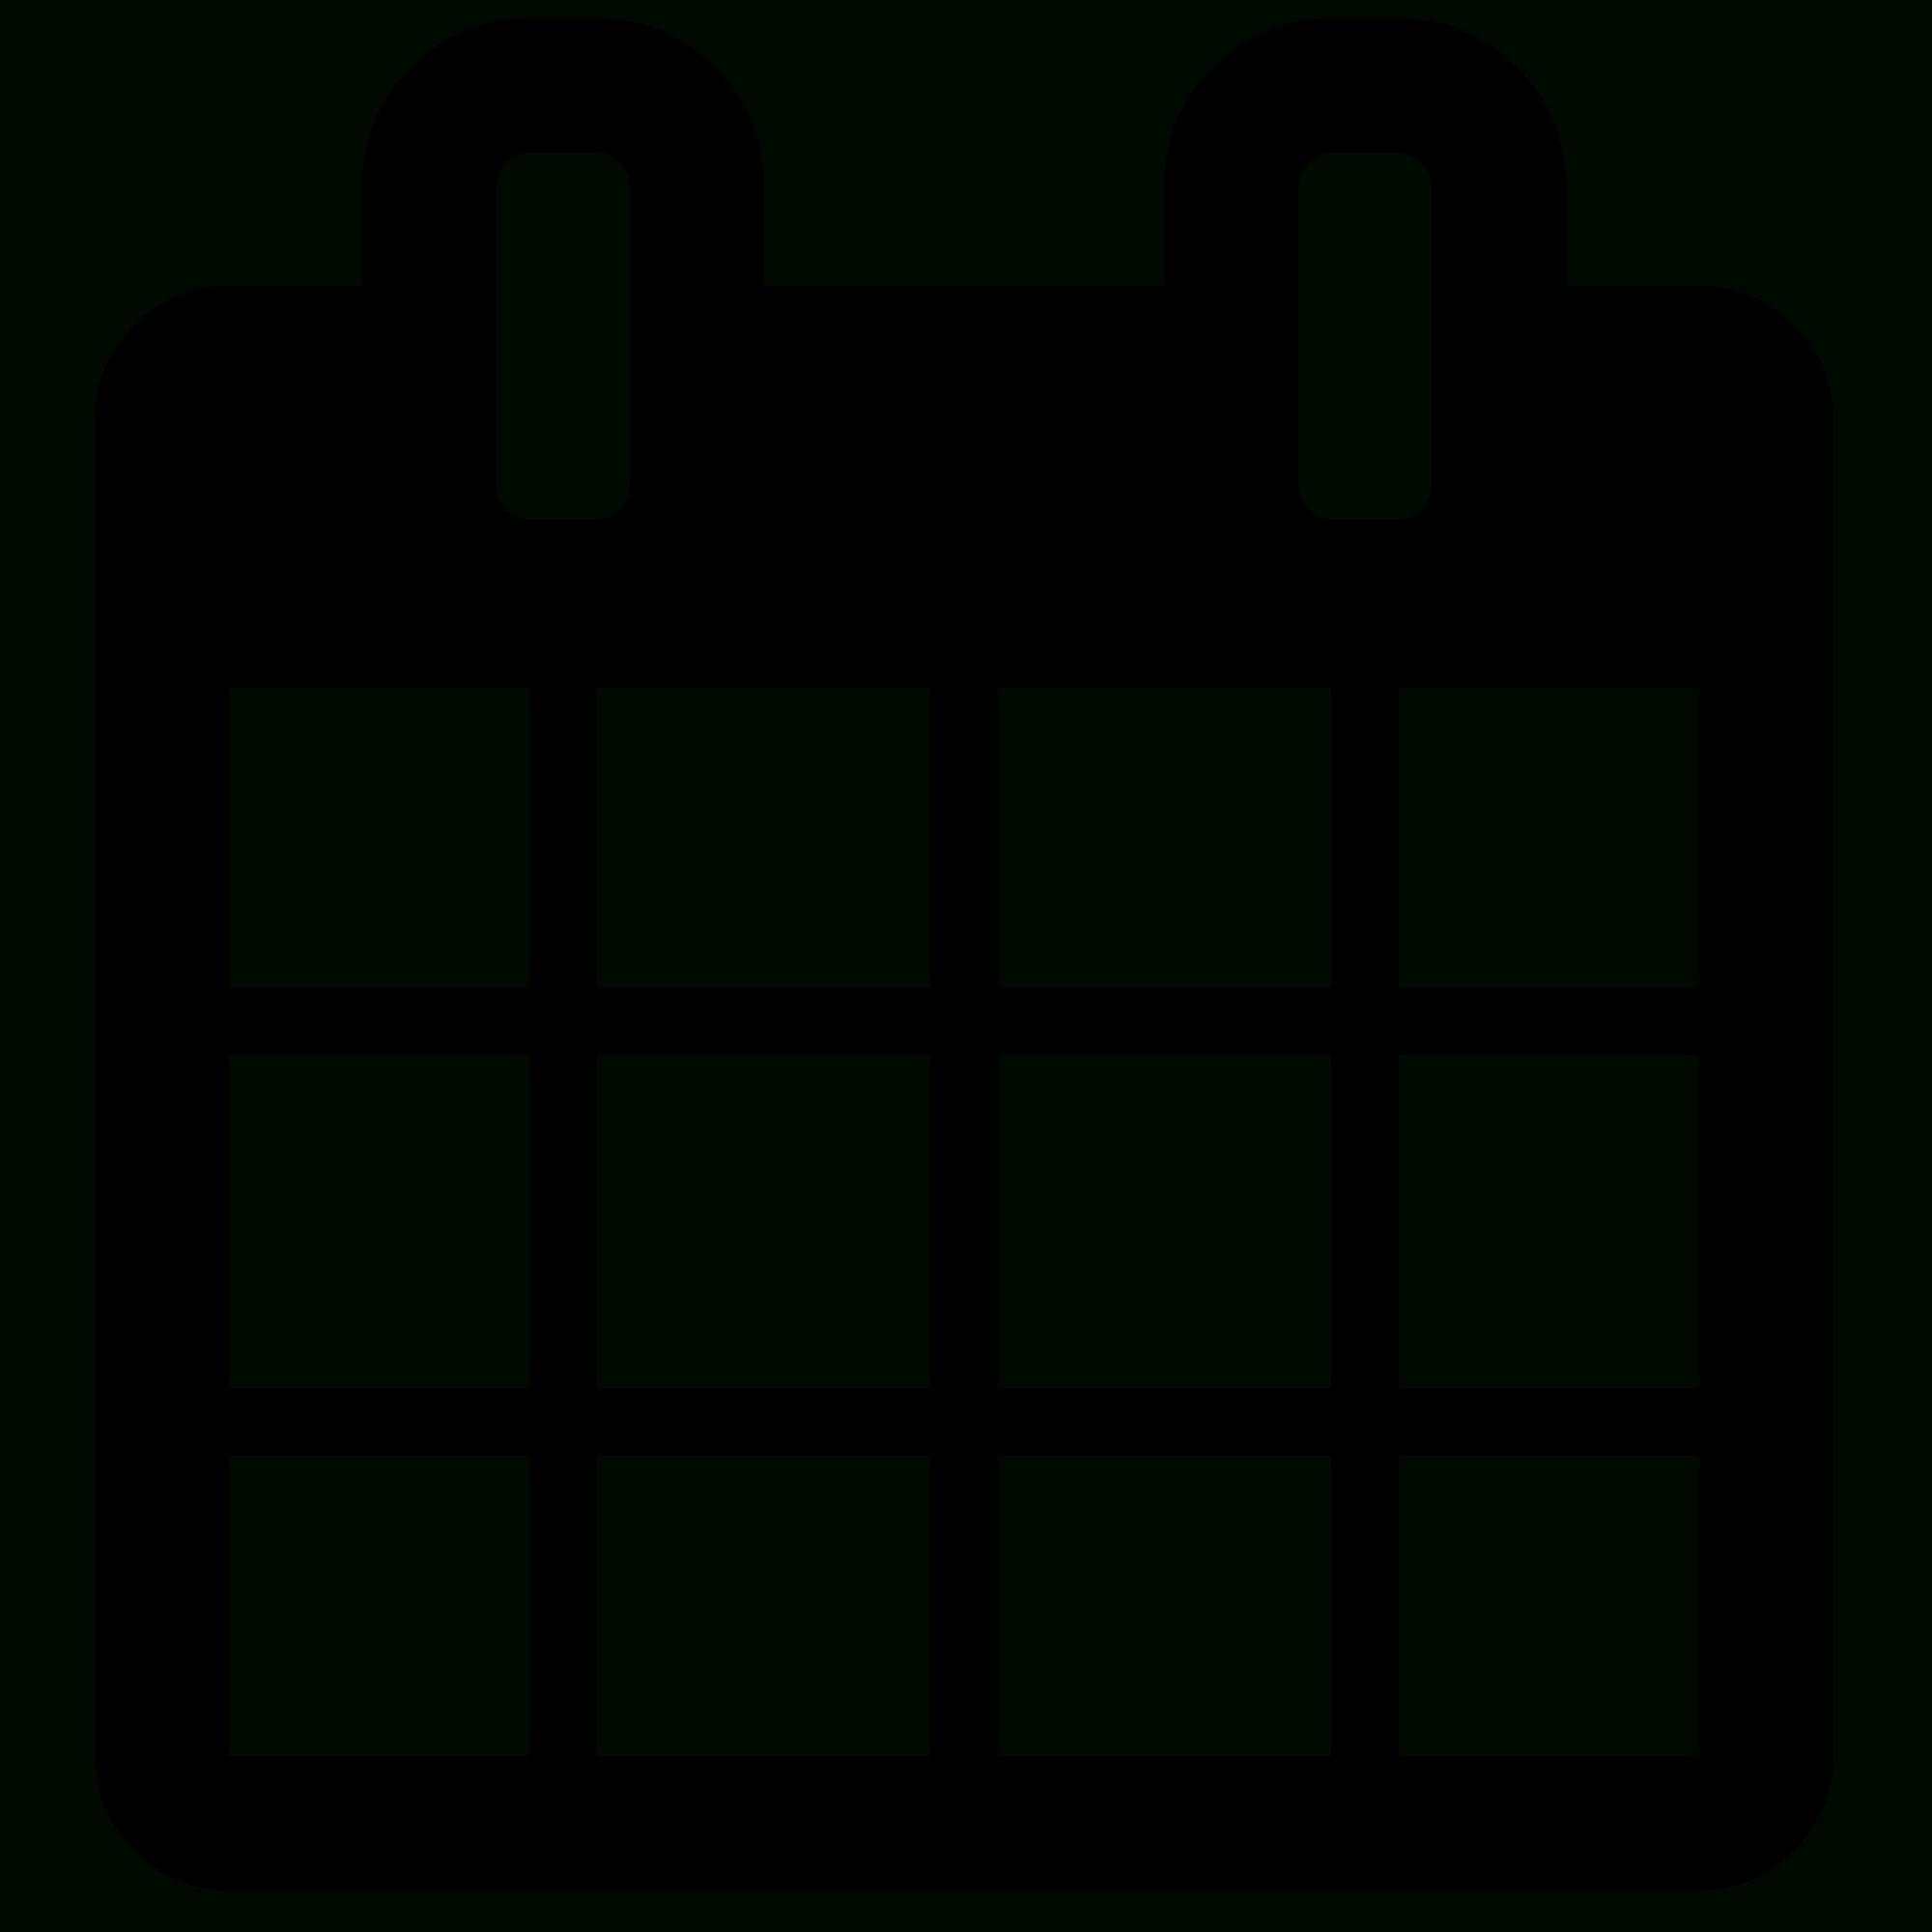 Now Available Online: The Academic Calendar 2019-2020 | Tu inside Tu Delft Calendar 2019 2020